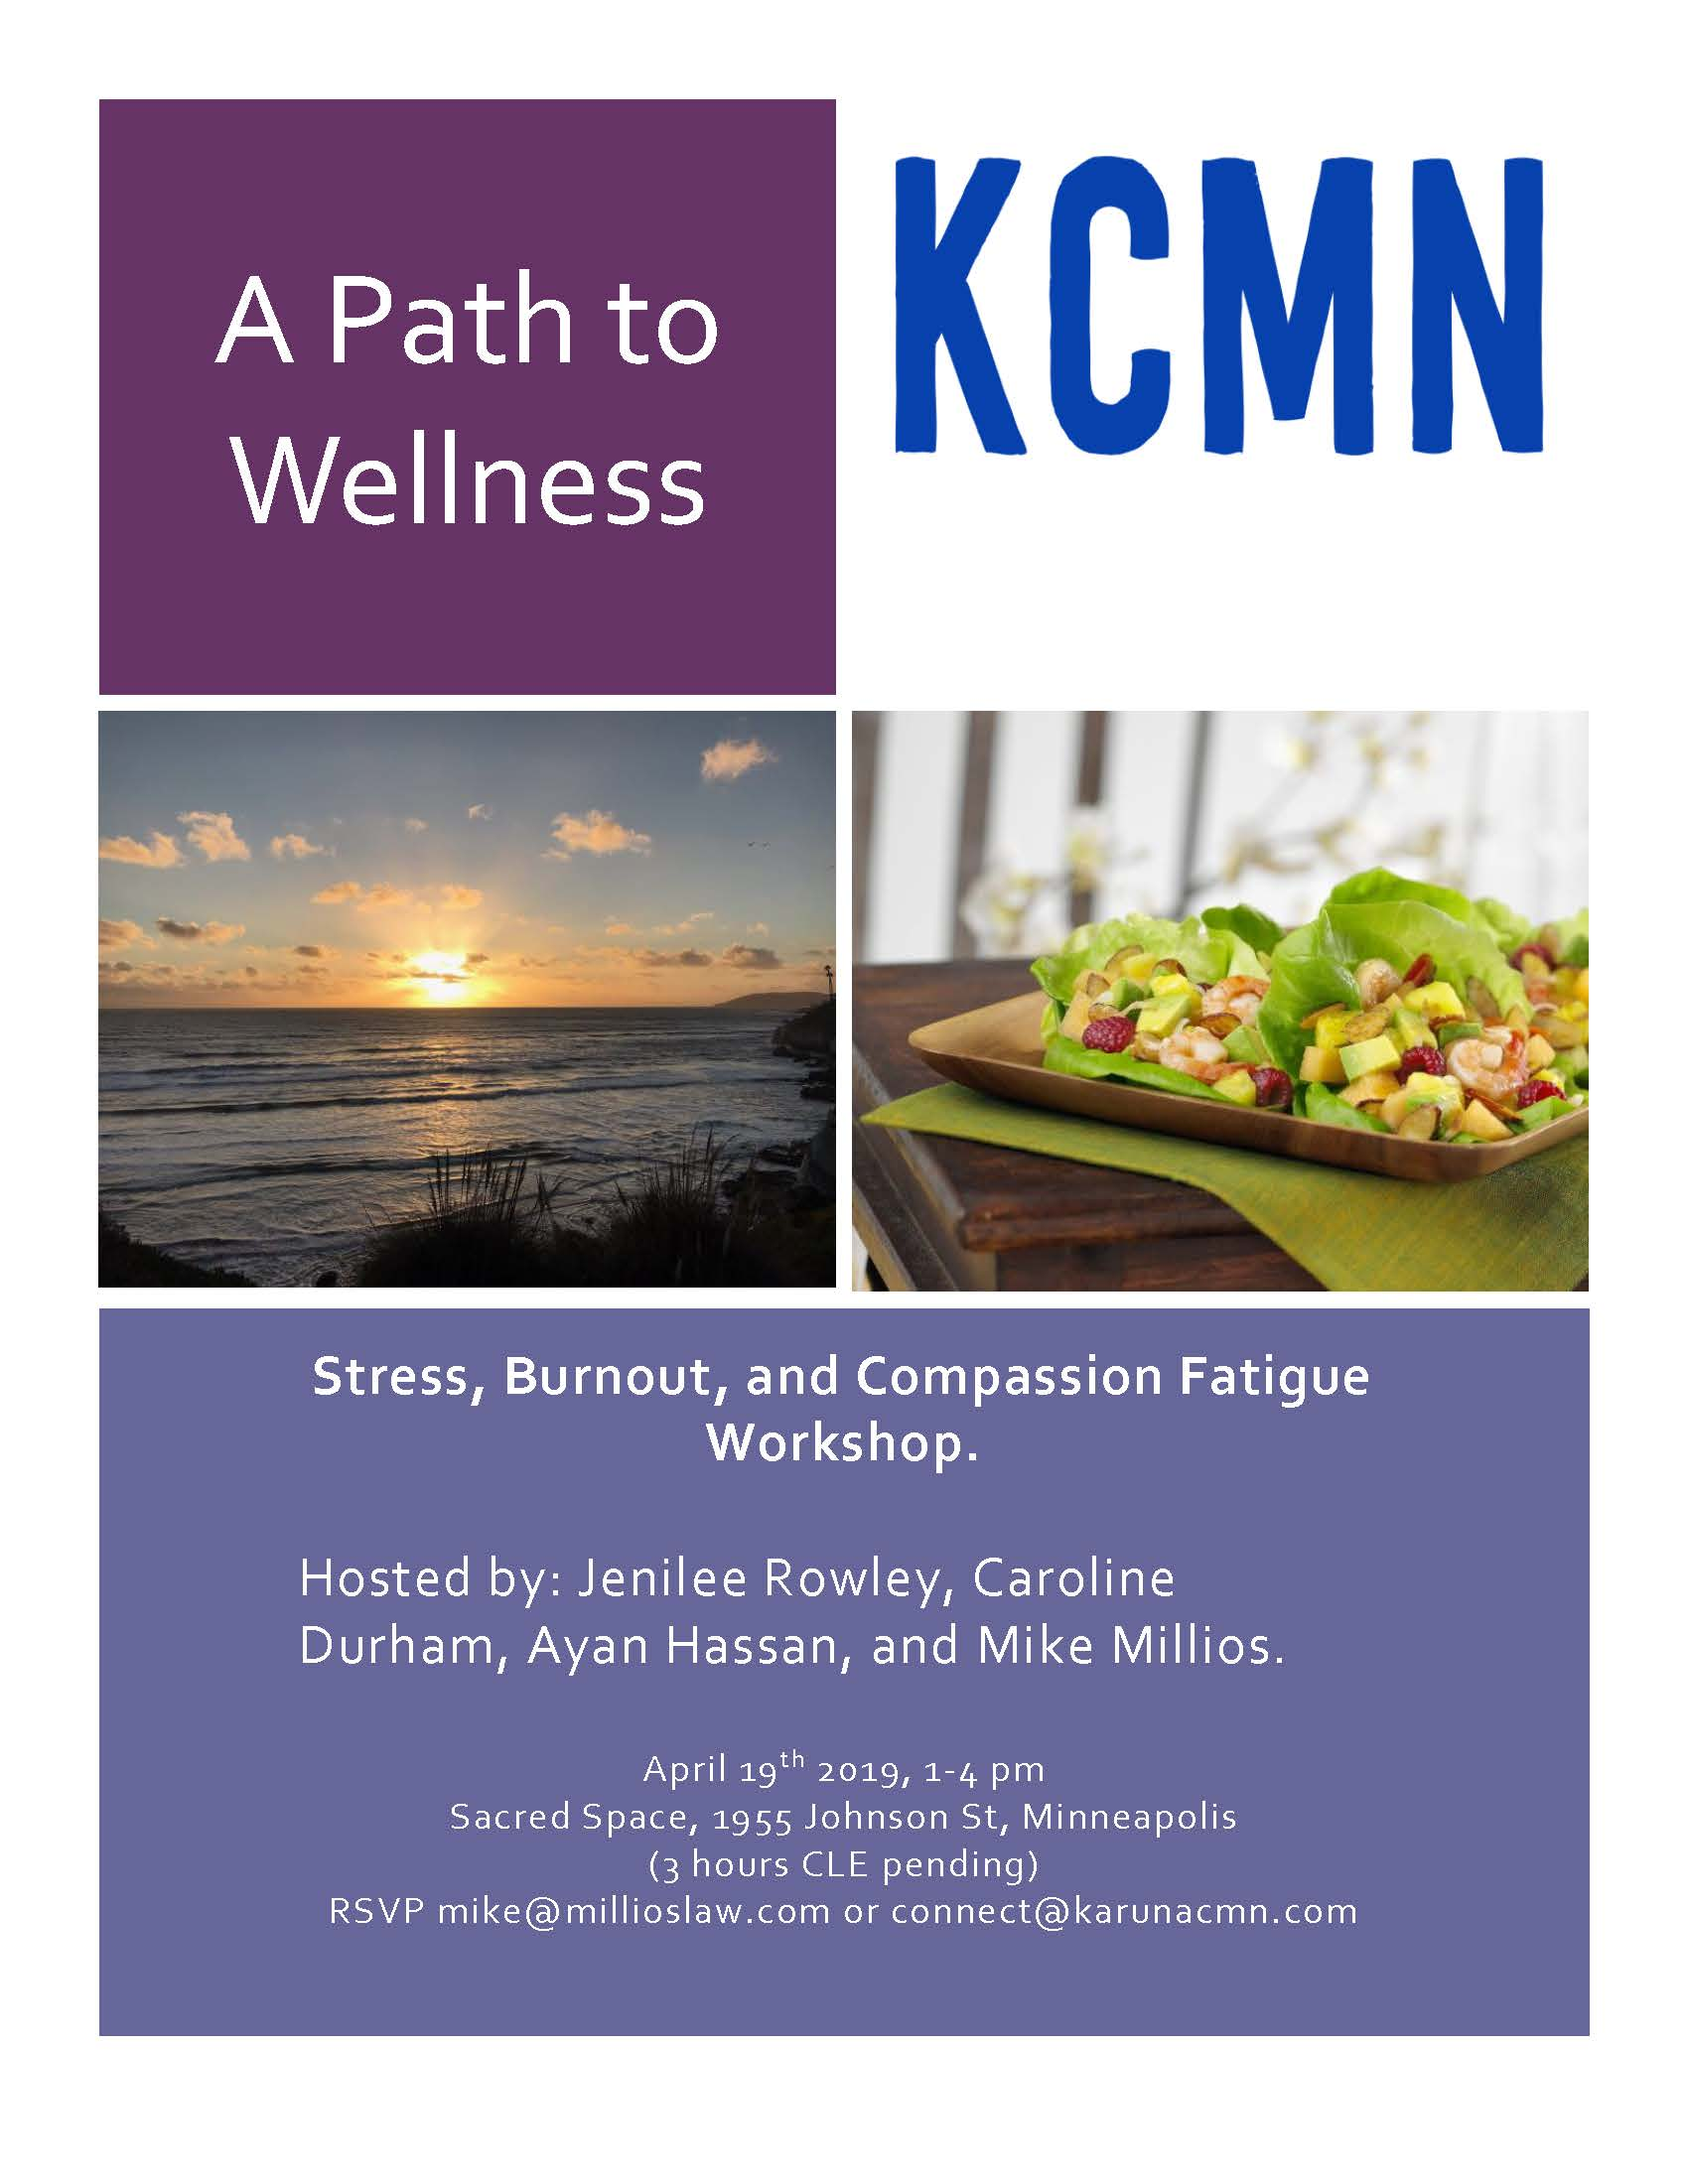 A Path to Wellness_Page_1.jpg